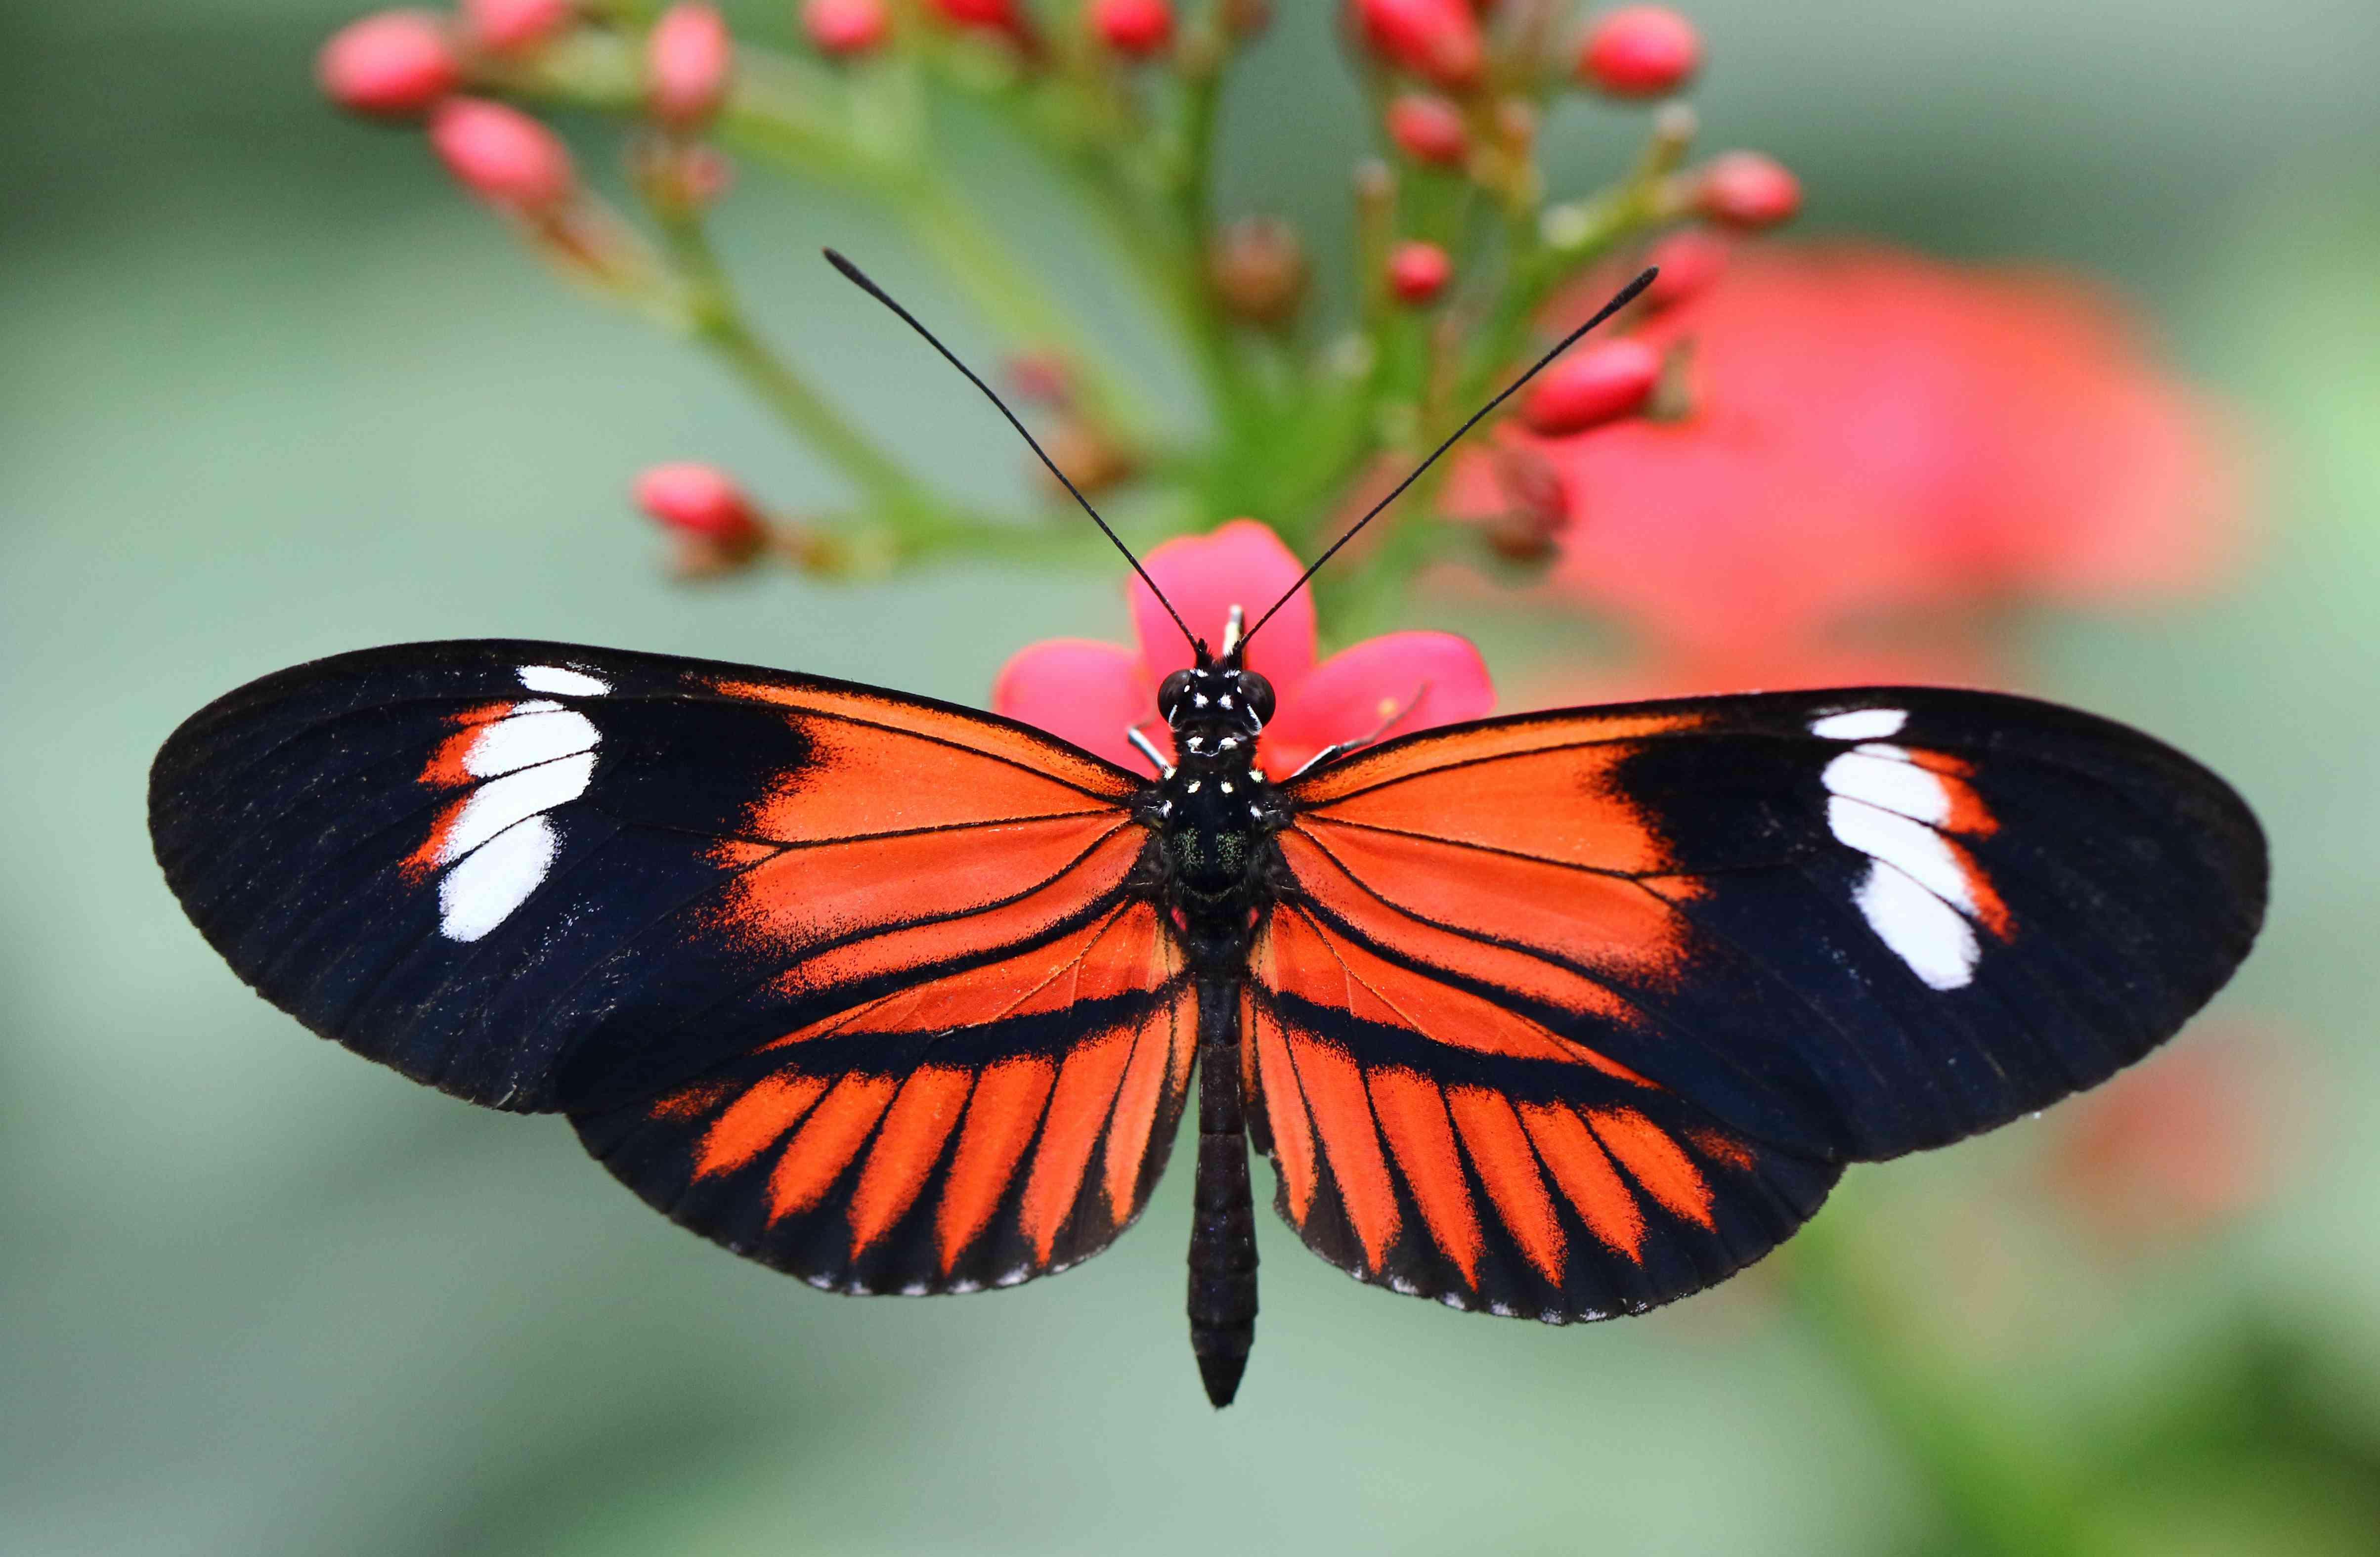 Red Postman Butterfly - Heliconius melpomene